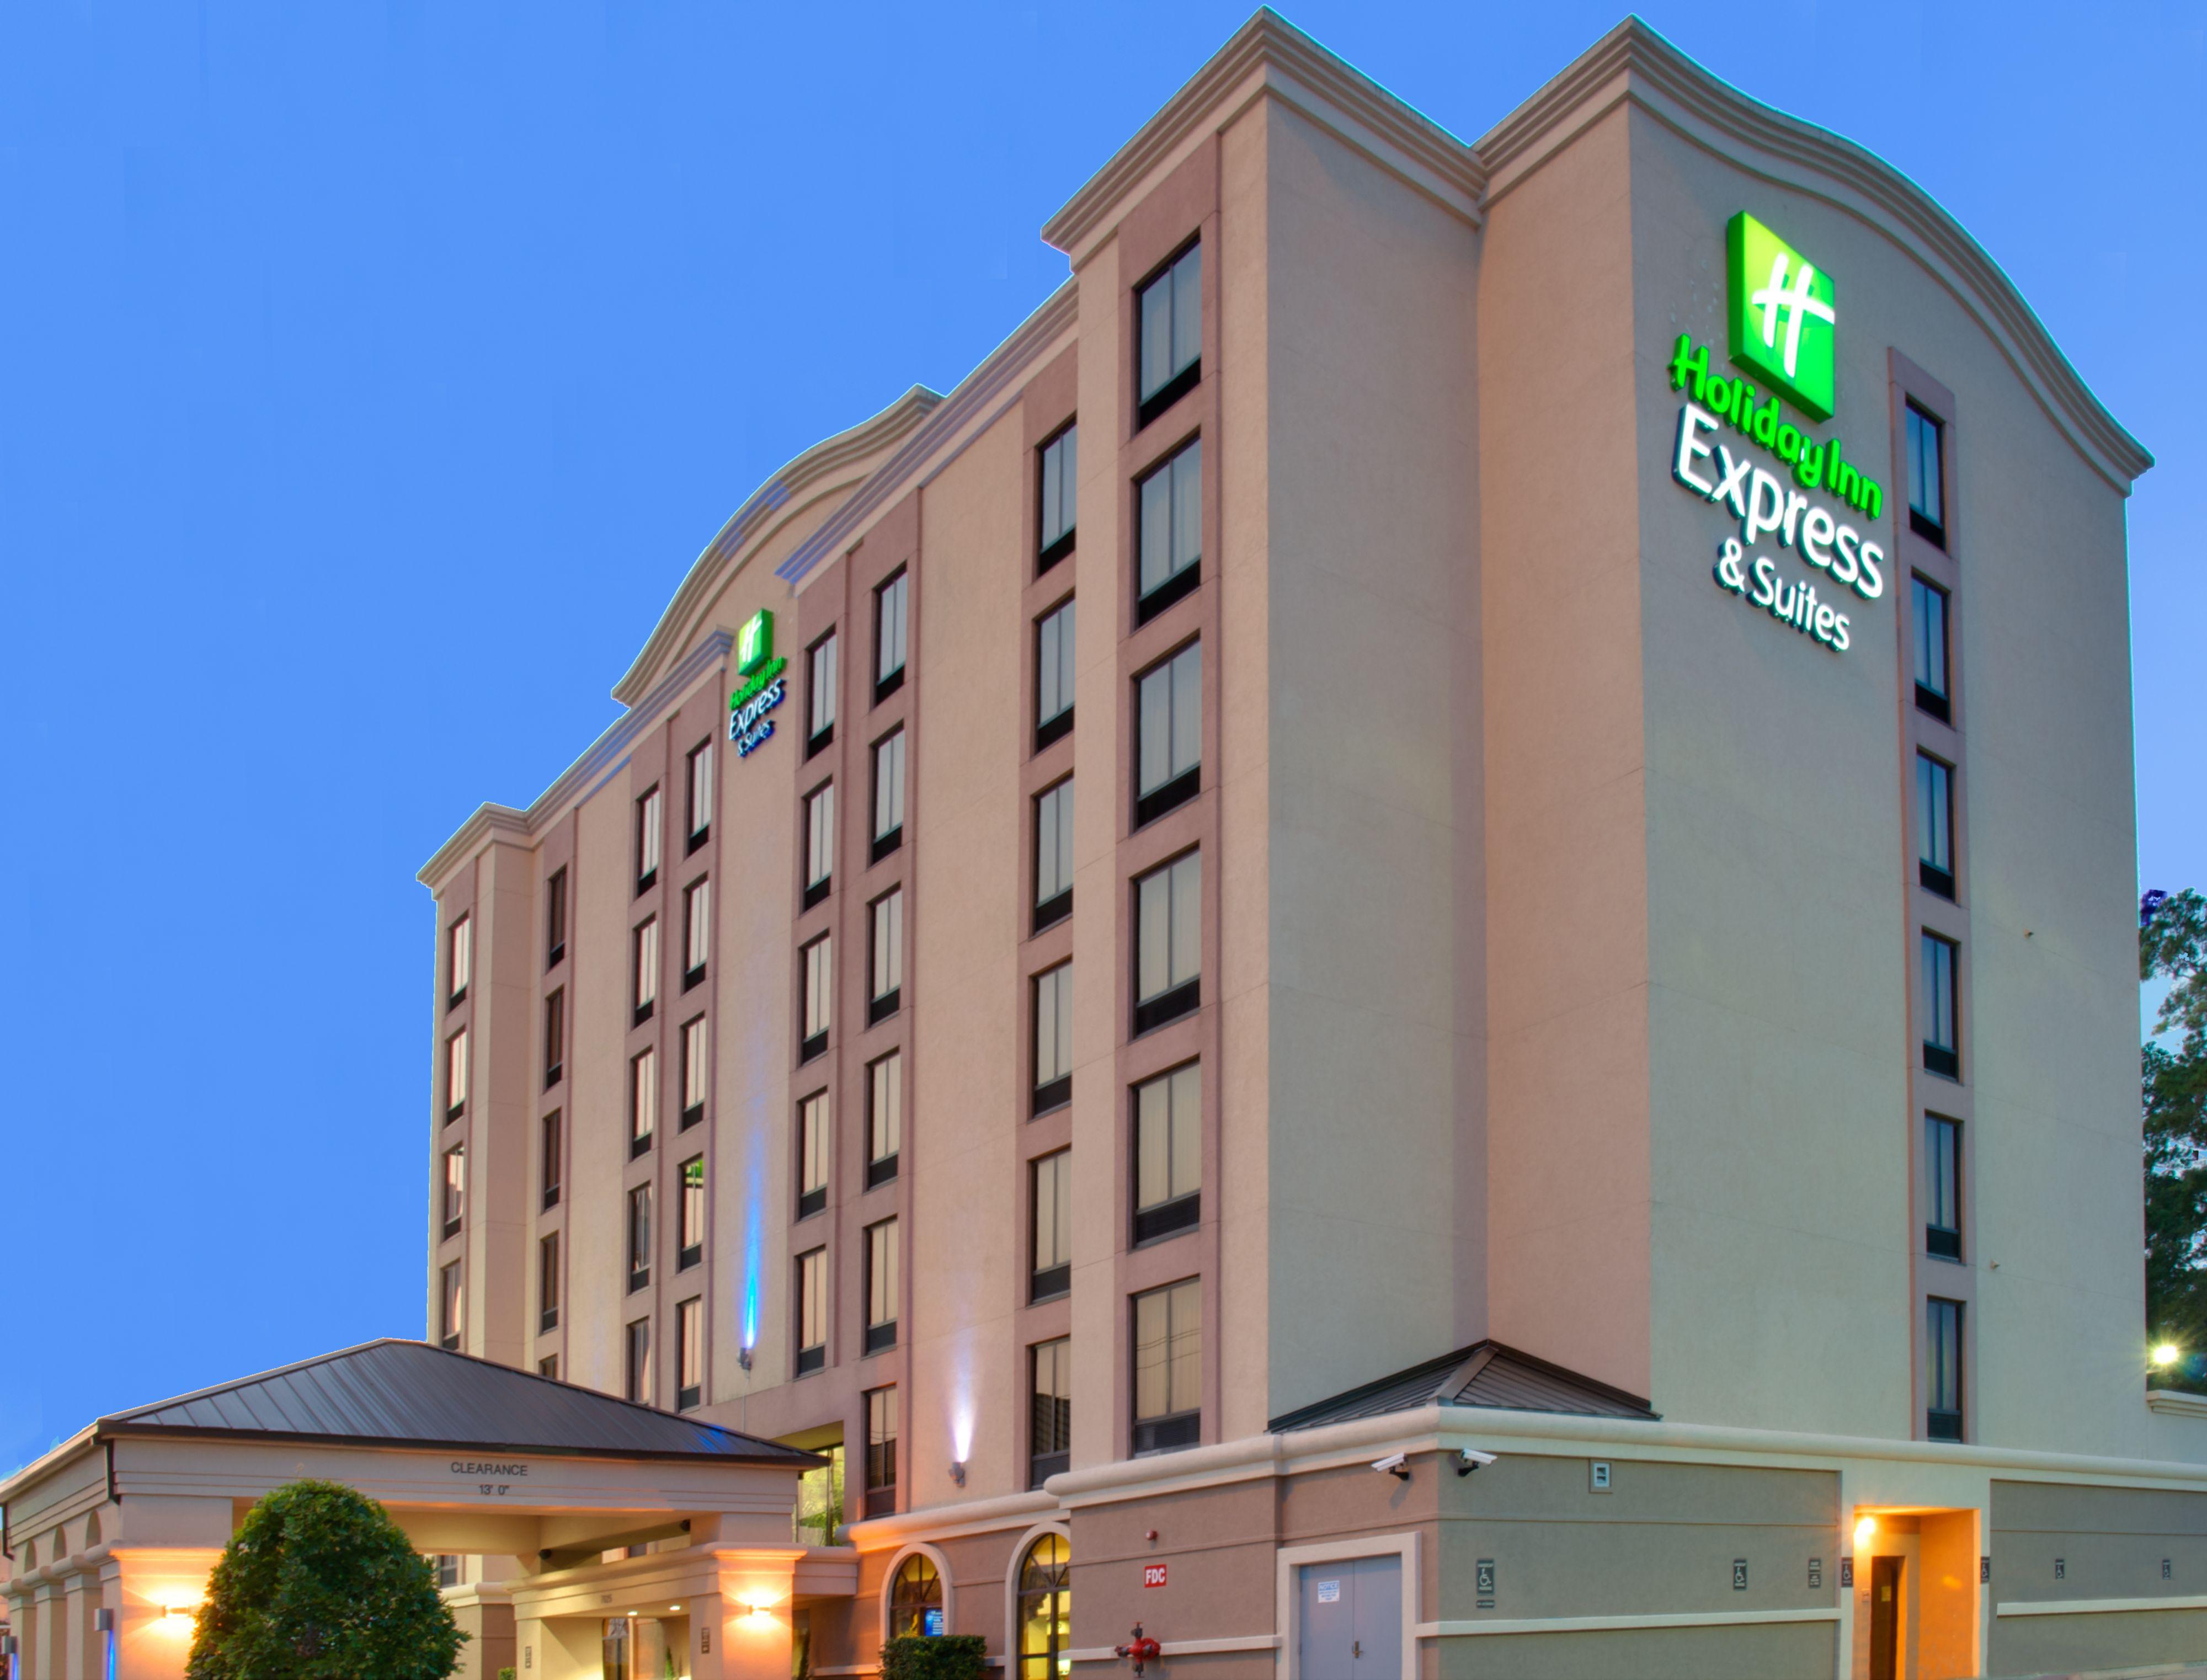 Holiday Inn Express Amp Suites Hou I 10 West Energy Corridor